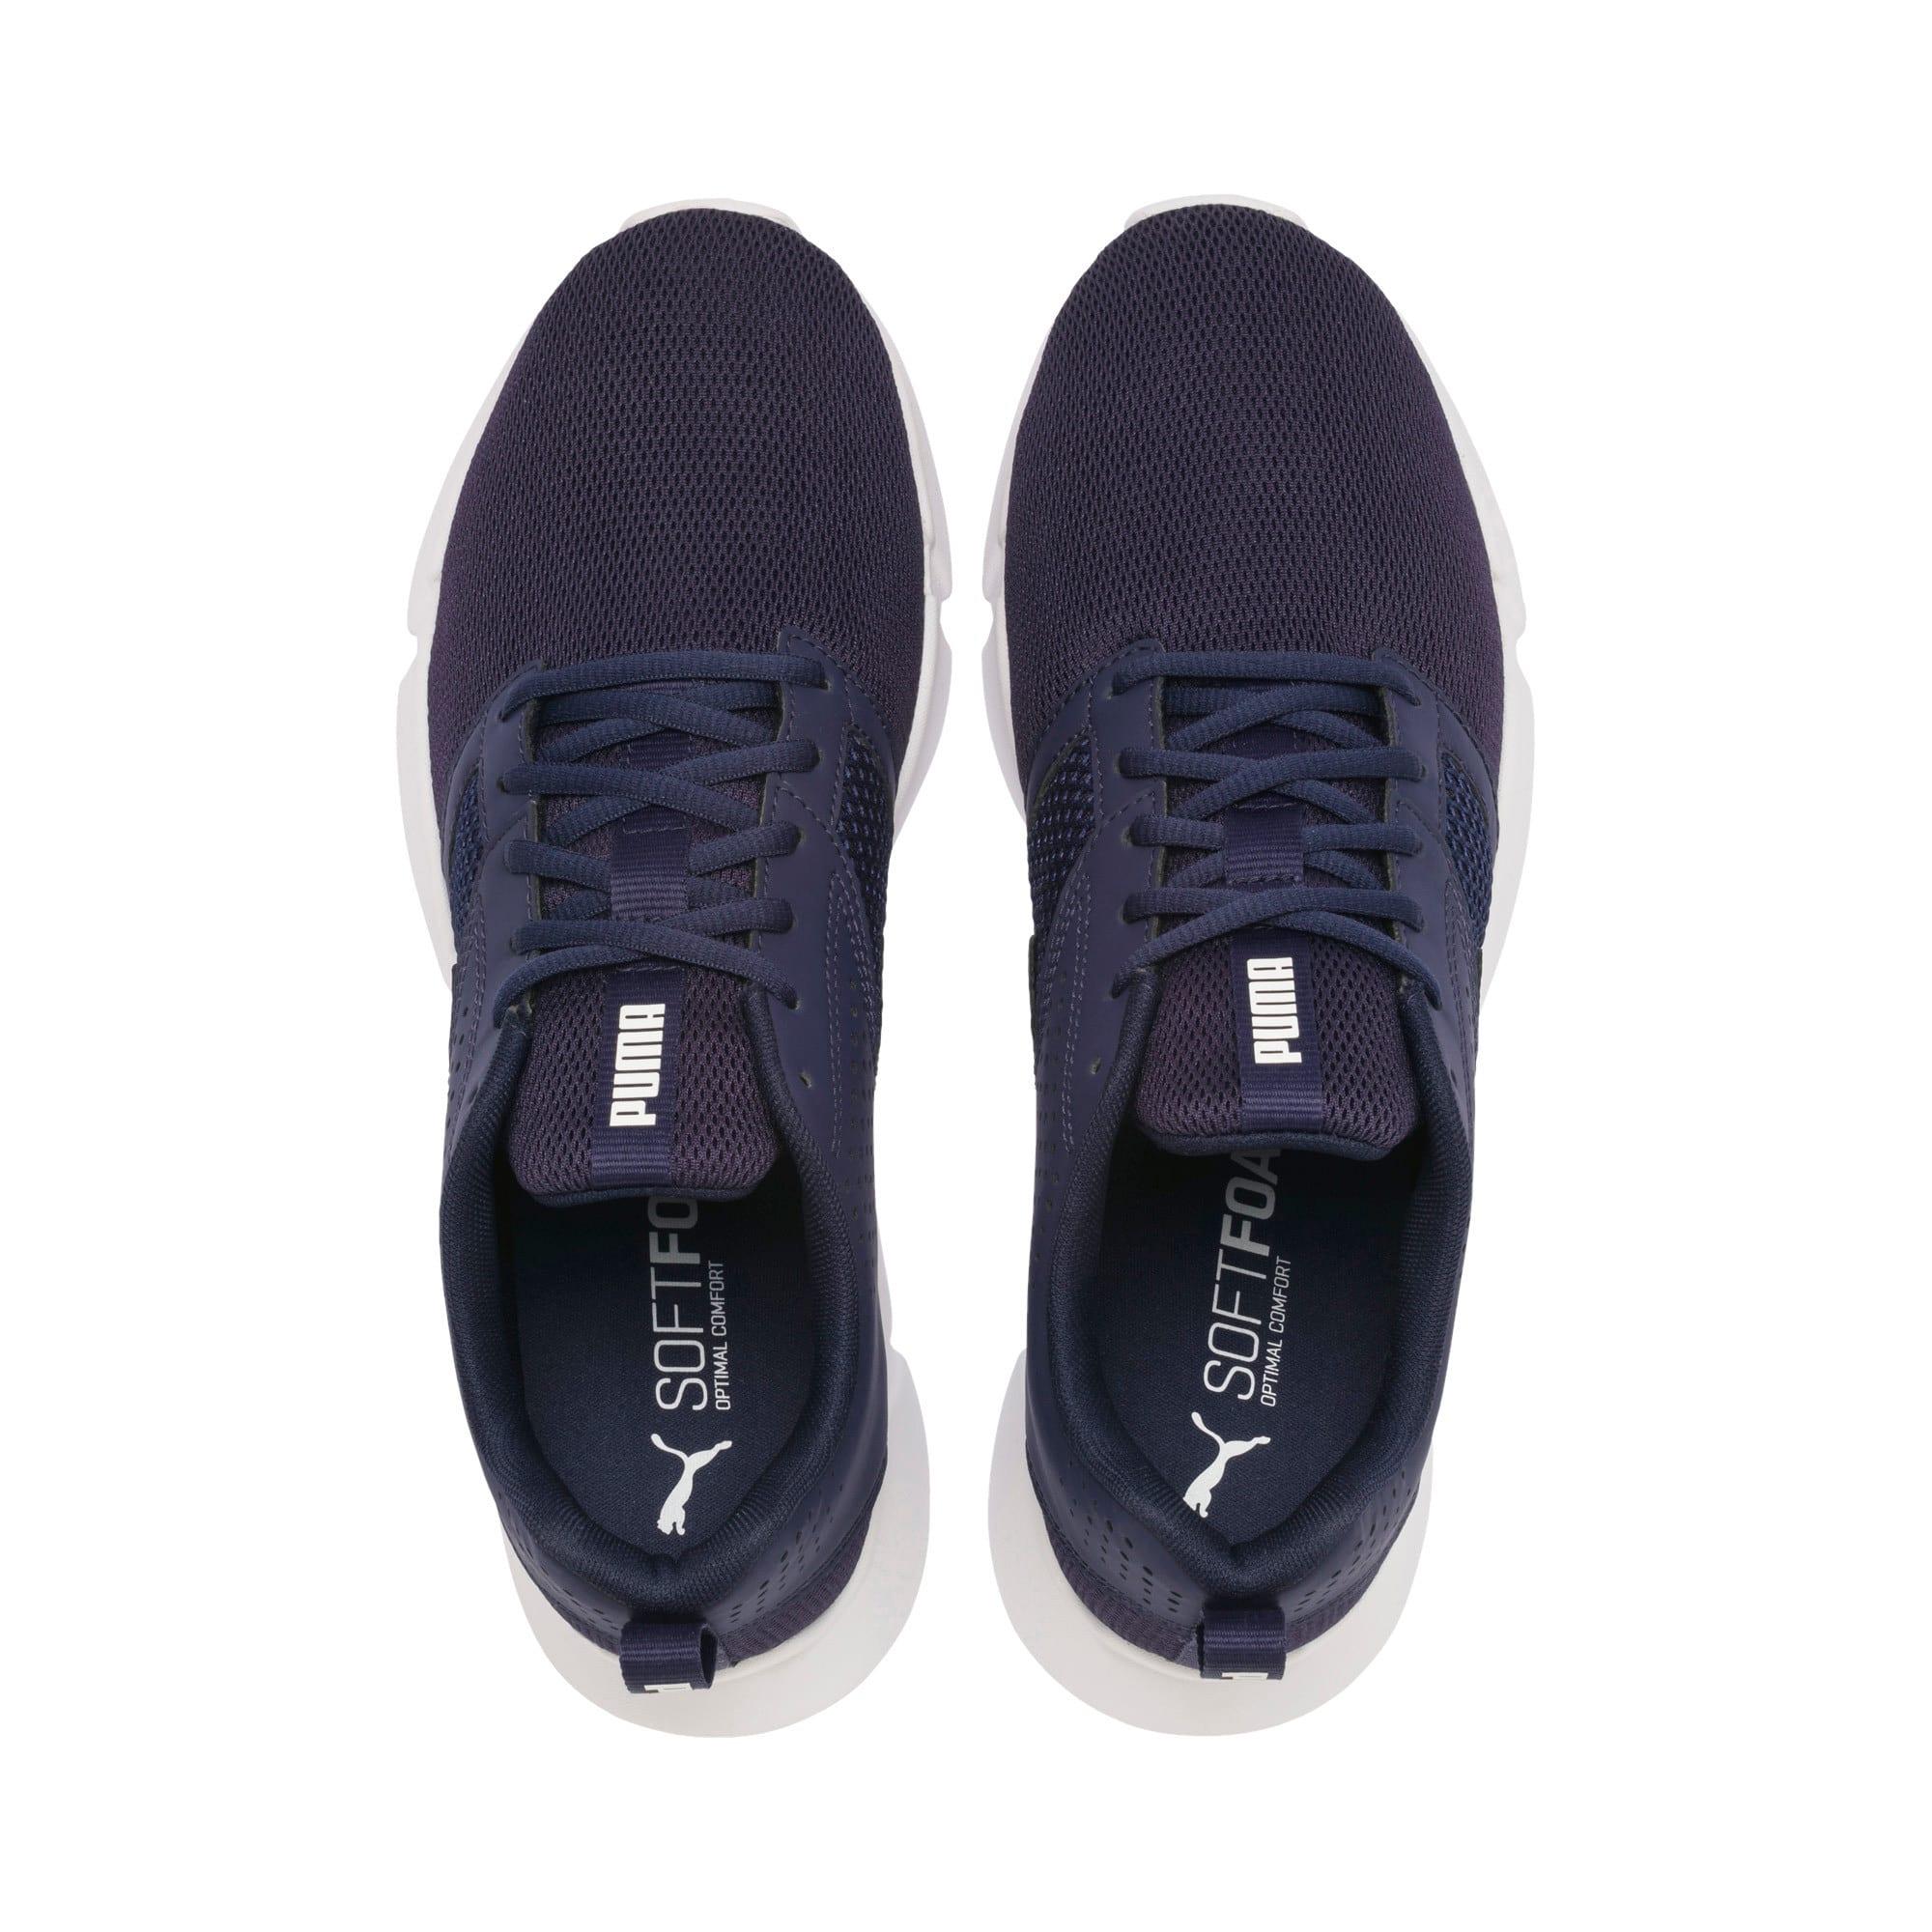 Thumbnail 8 of INTERFLEX Modern Running Shoes, Peacoat-Puma White, medium-IND